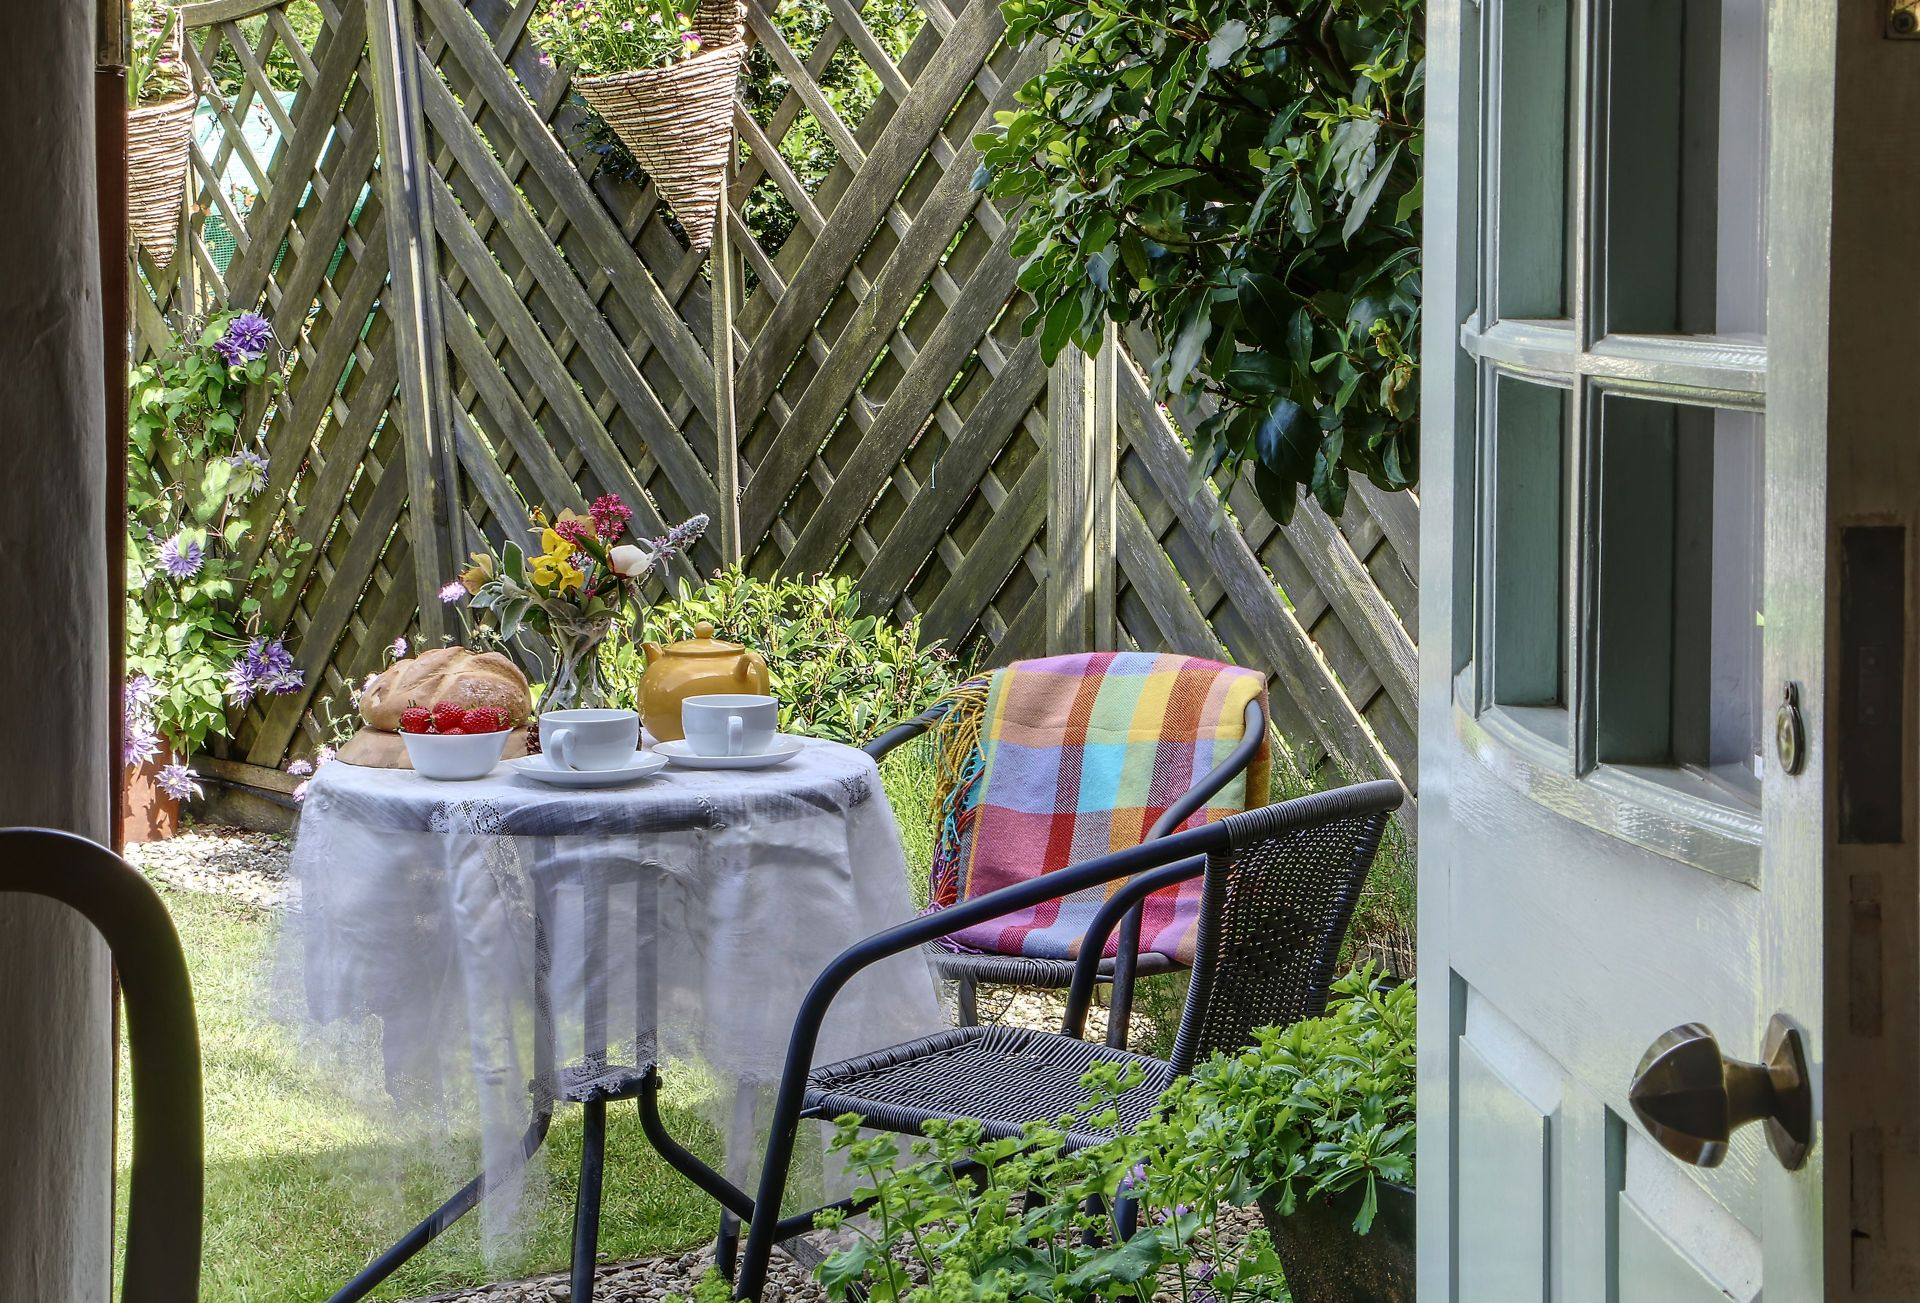 An aspect of the back garden